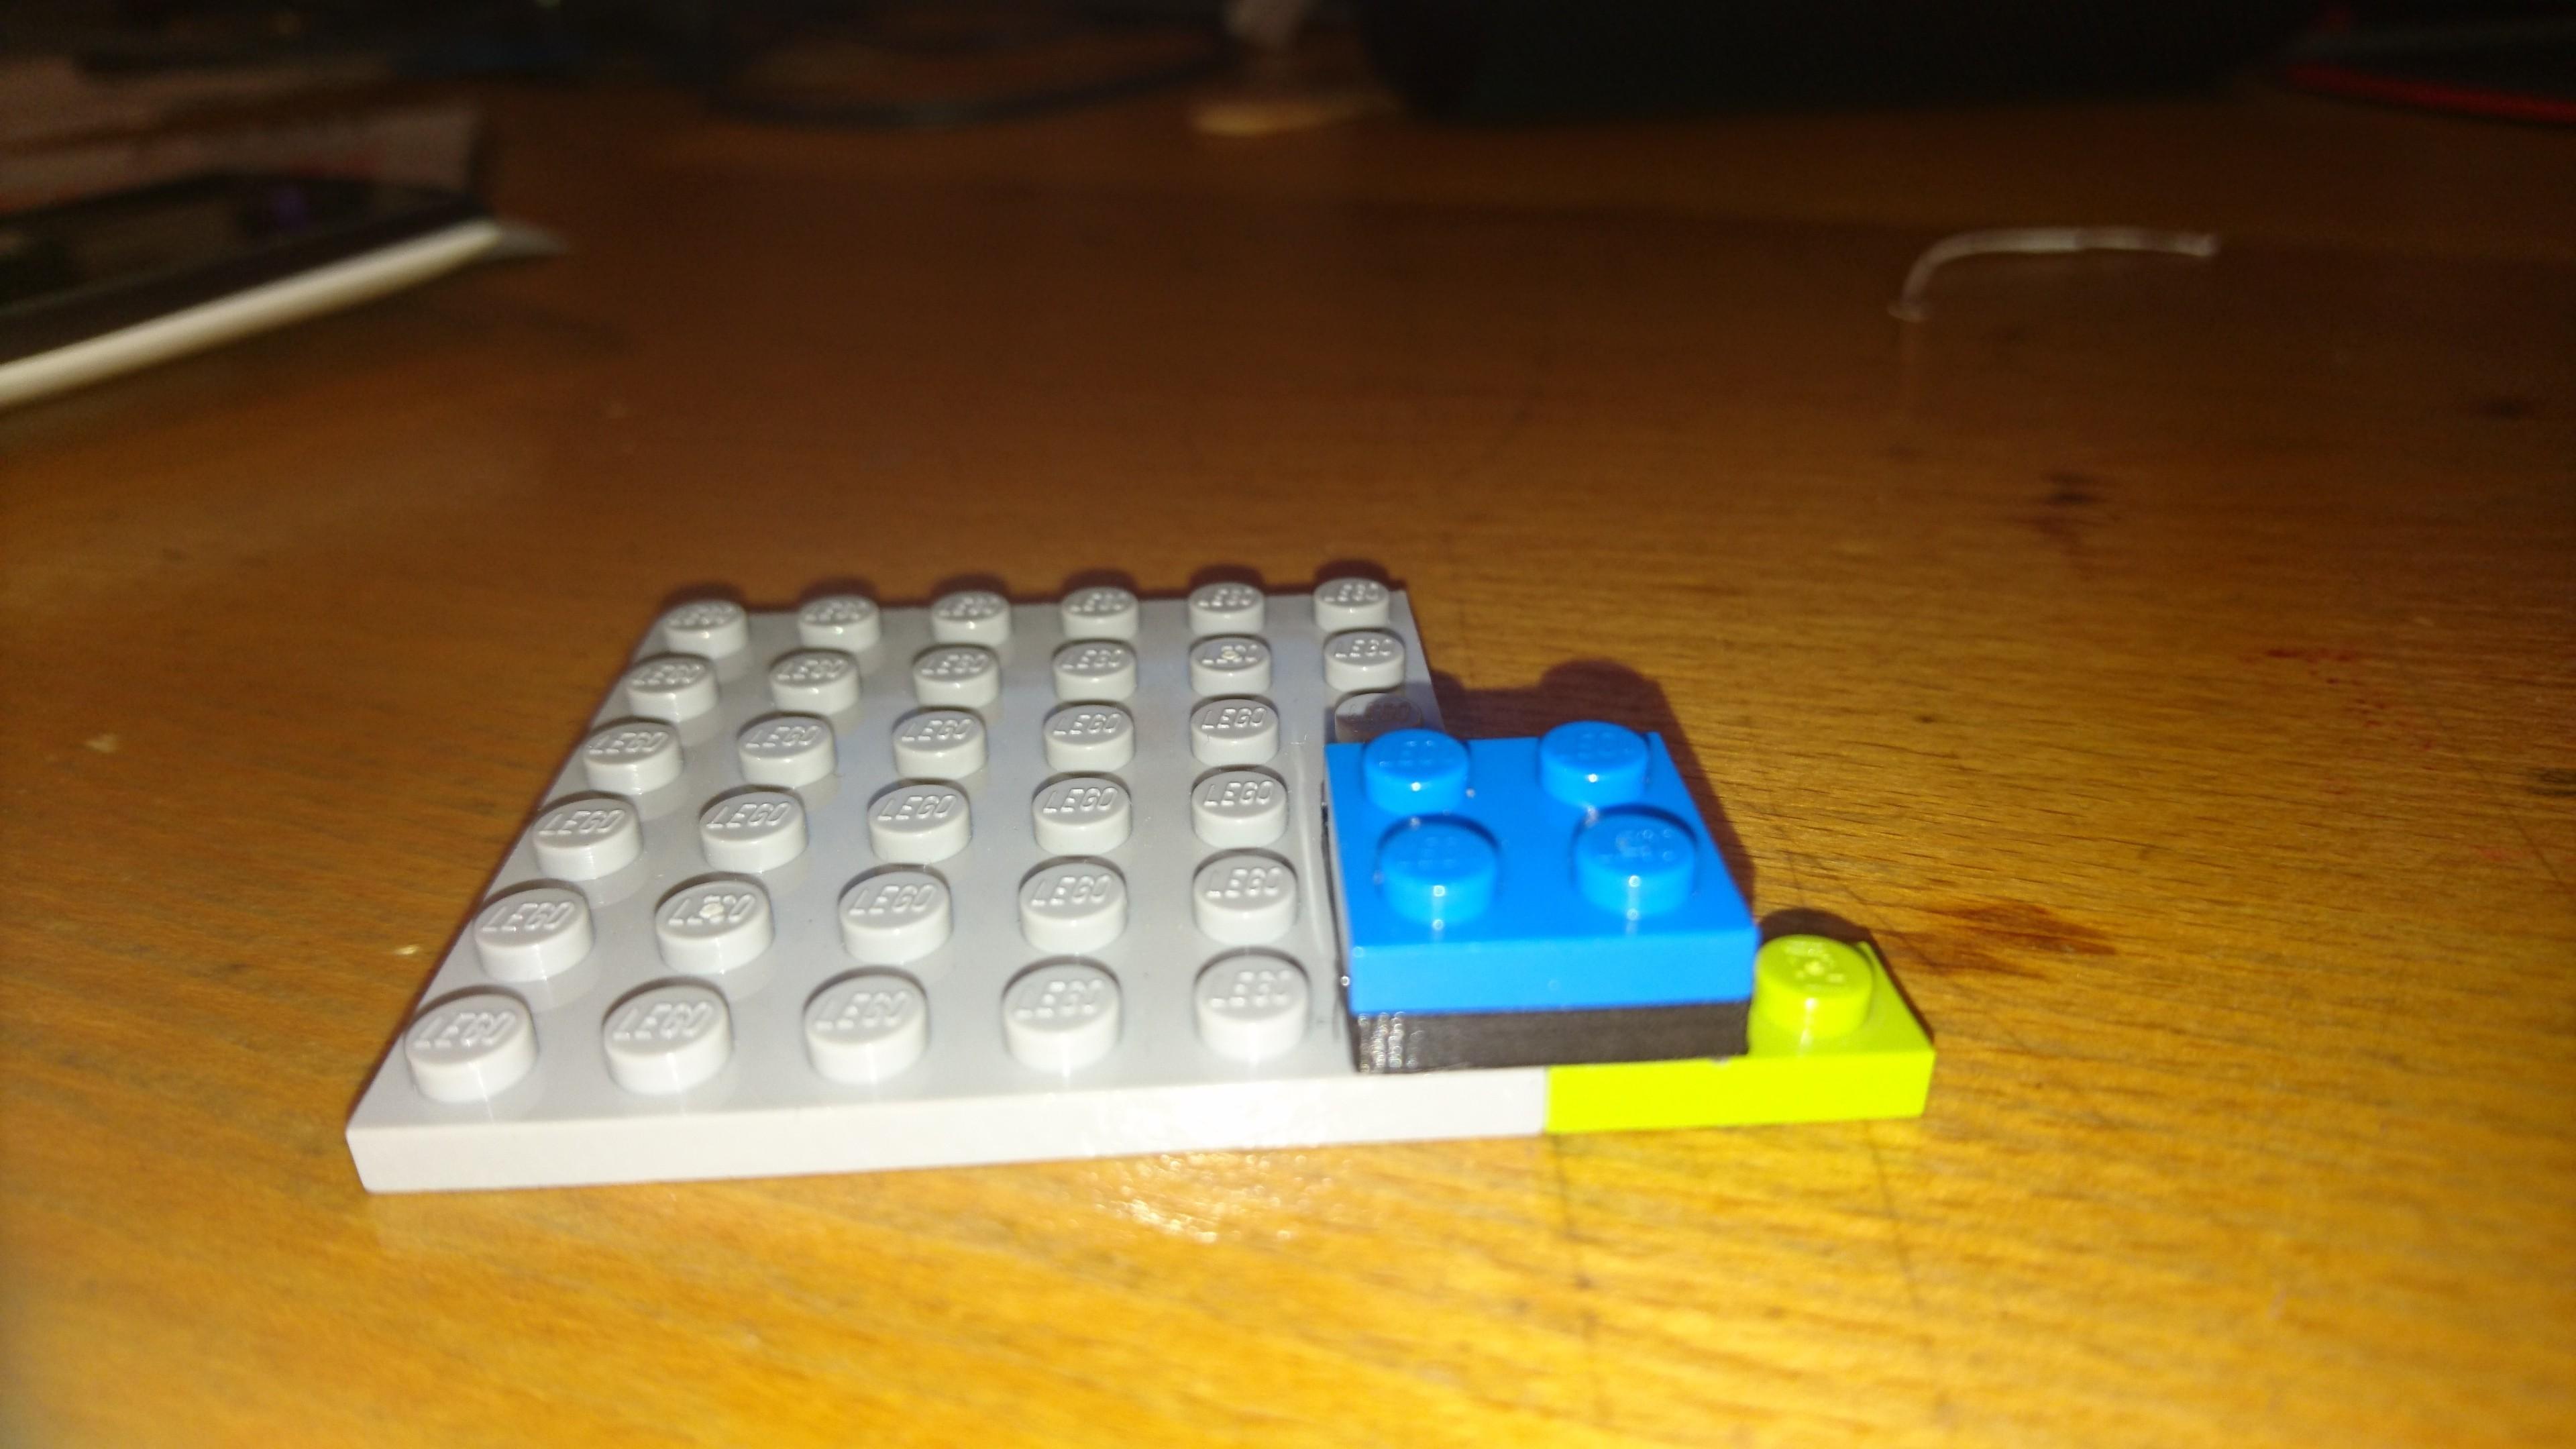 DSC_0001.JPG Download free STL file Plate 2x2 lego • Design to 3D print, Lys